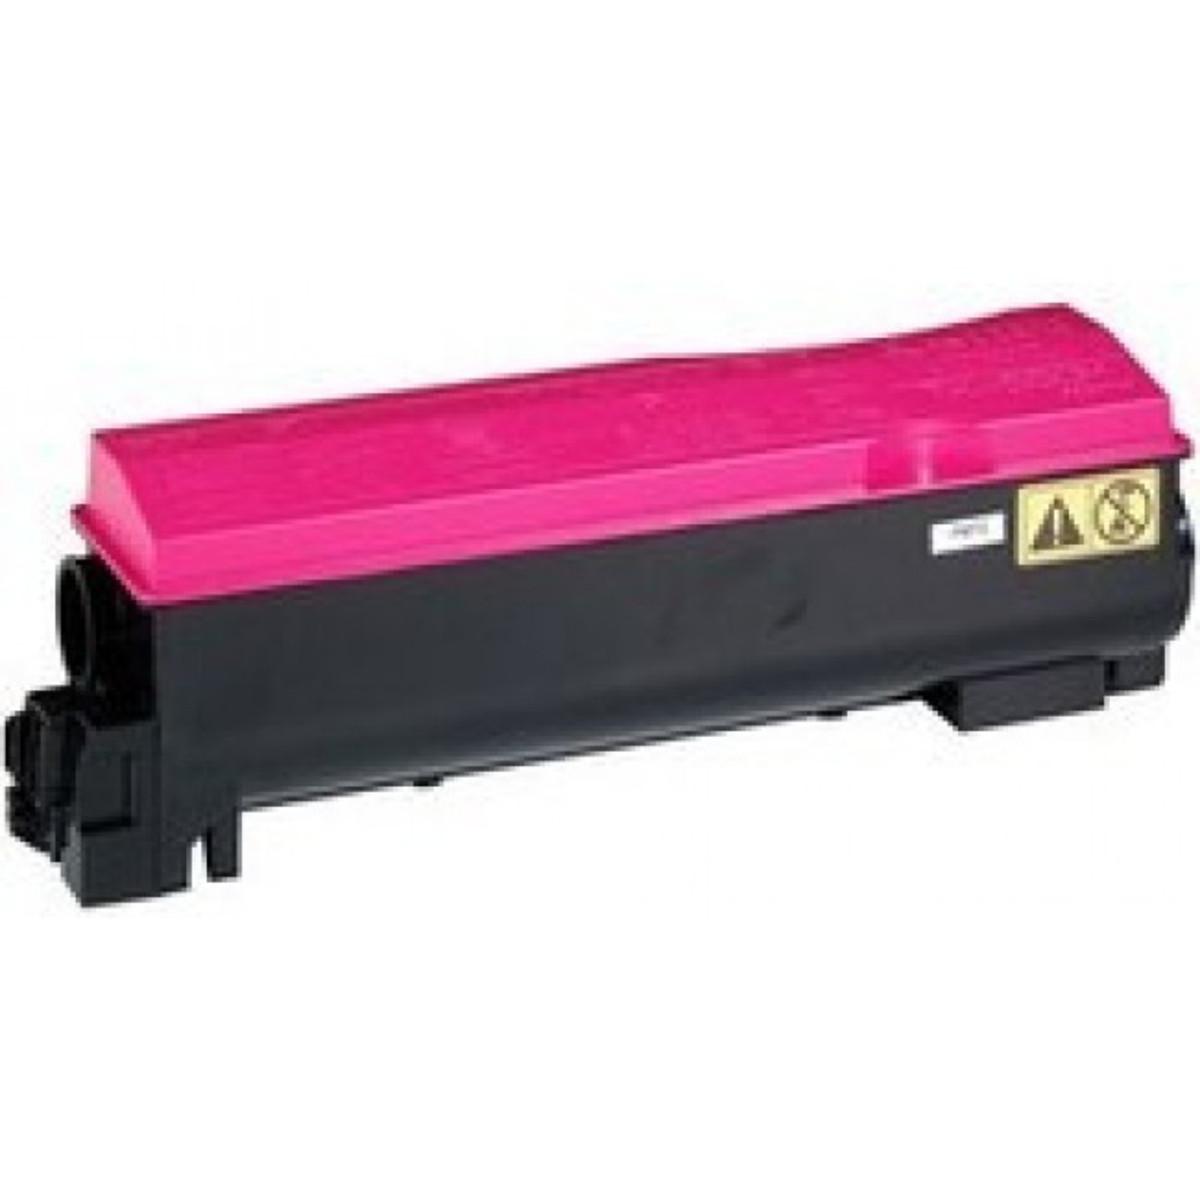 Kyocera TK-8319M Magenta Toner Cartridge